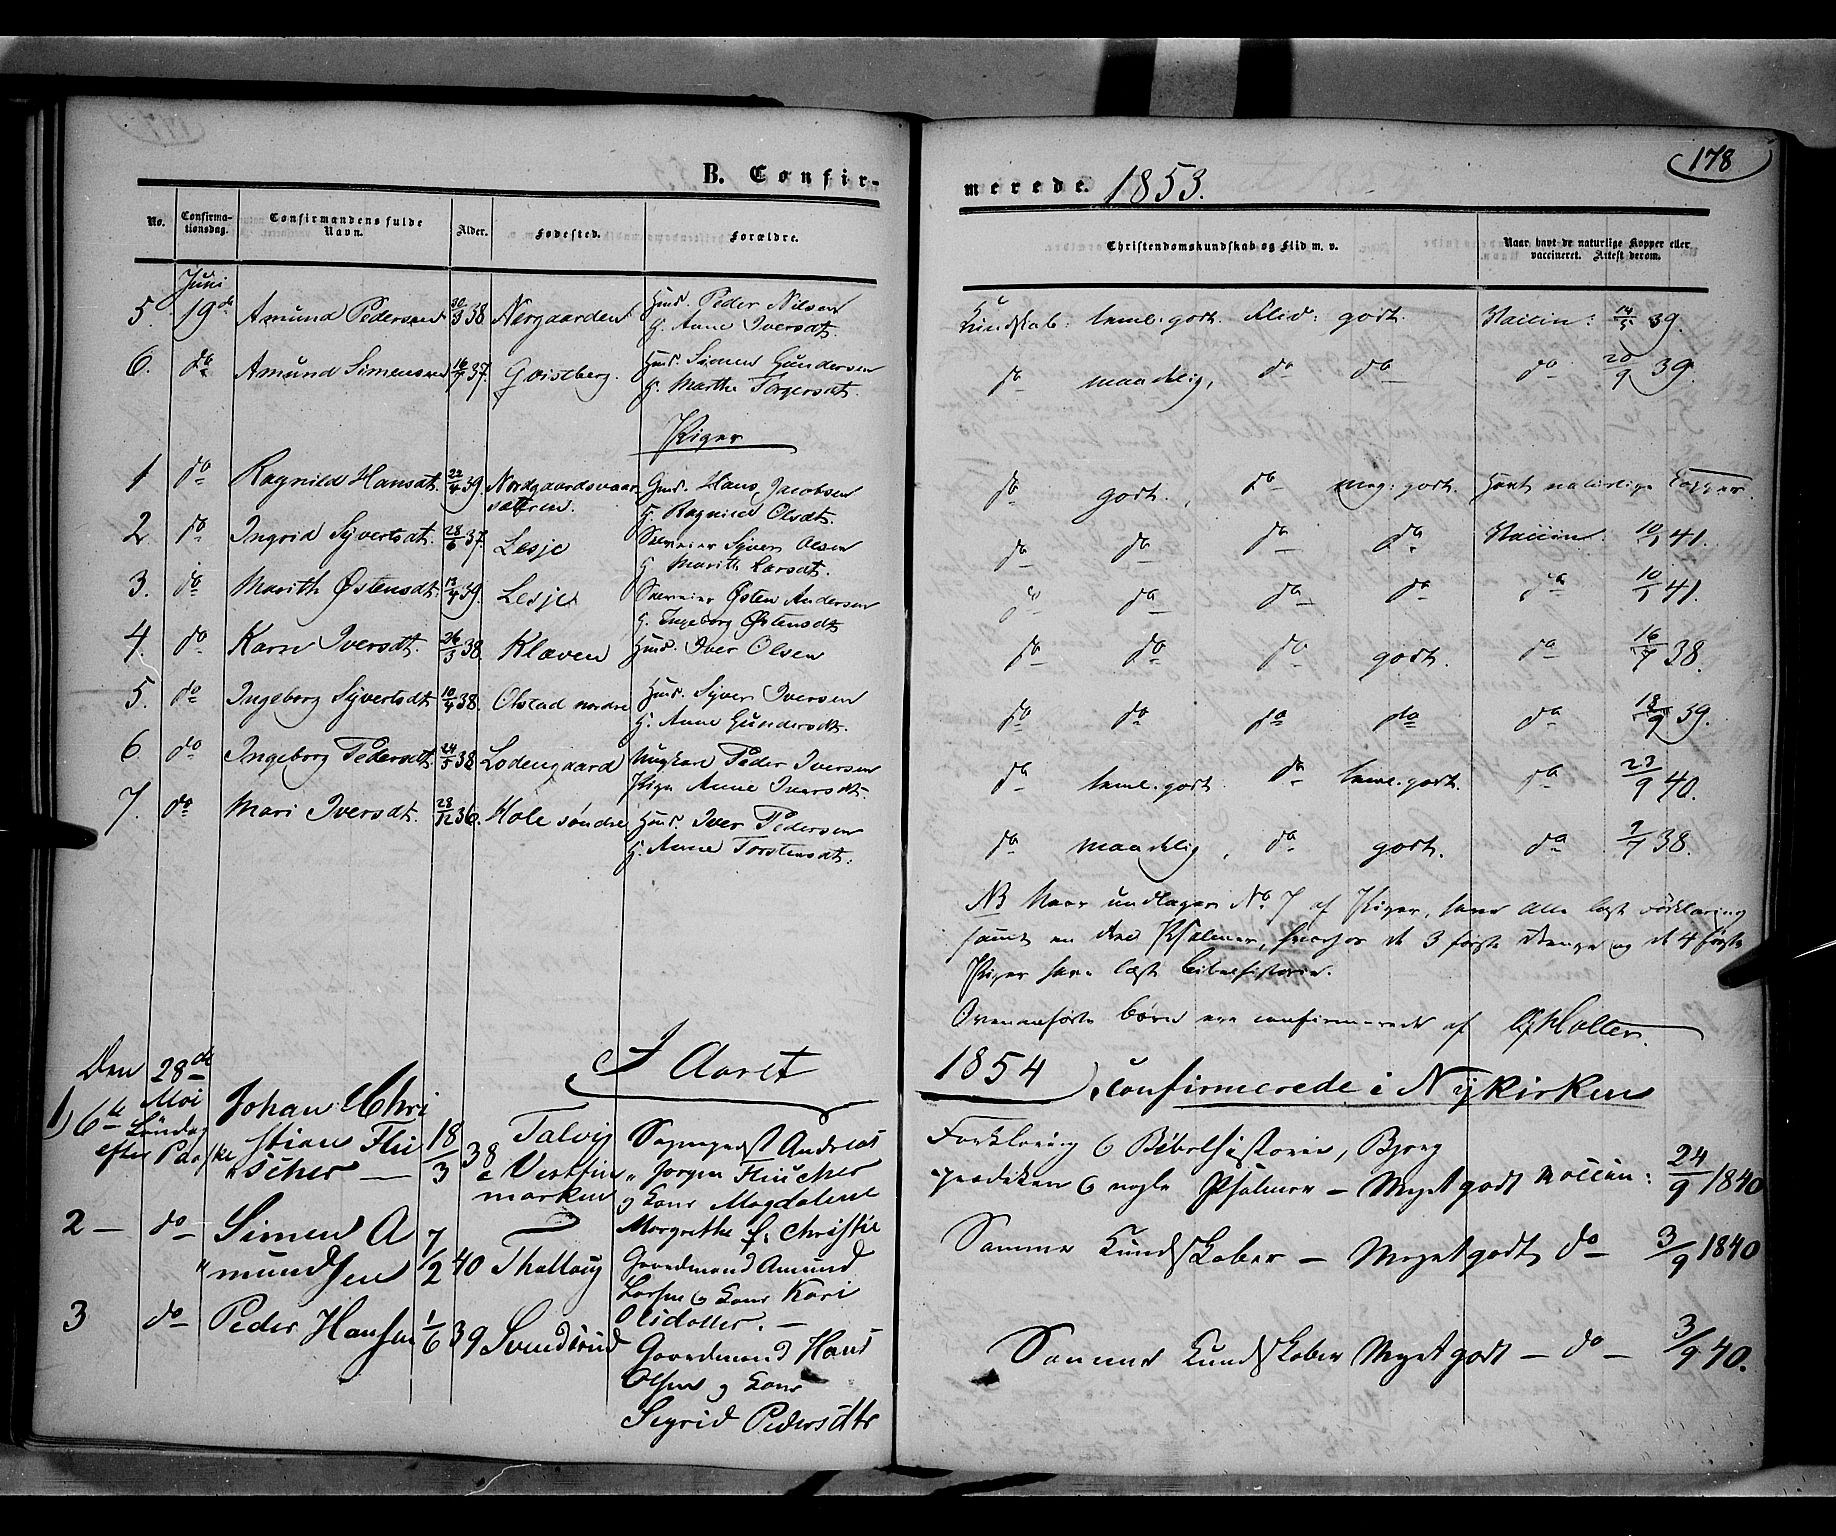 SAH, Gausdal prestekontor, Ministerialbok nr. 8, 1850-1861, s. 178